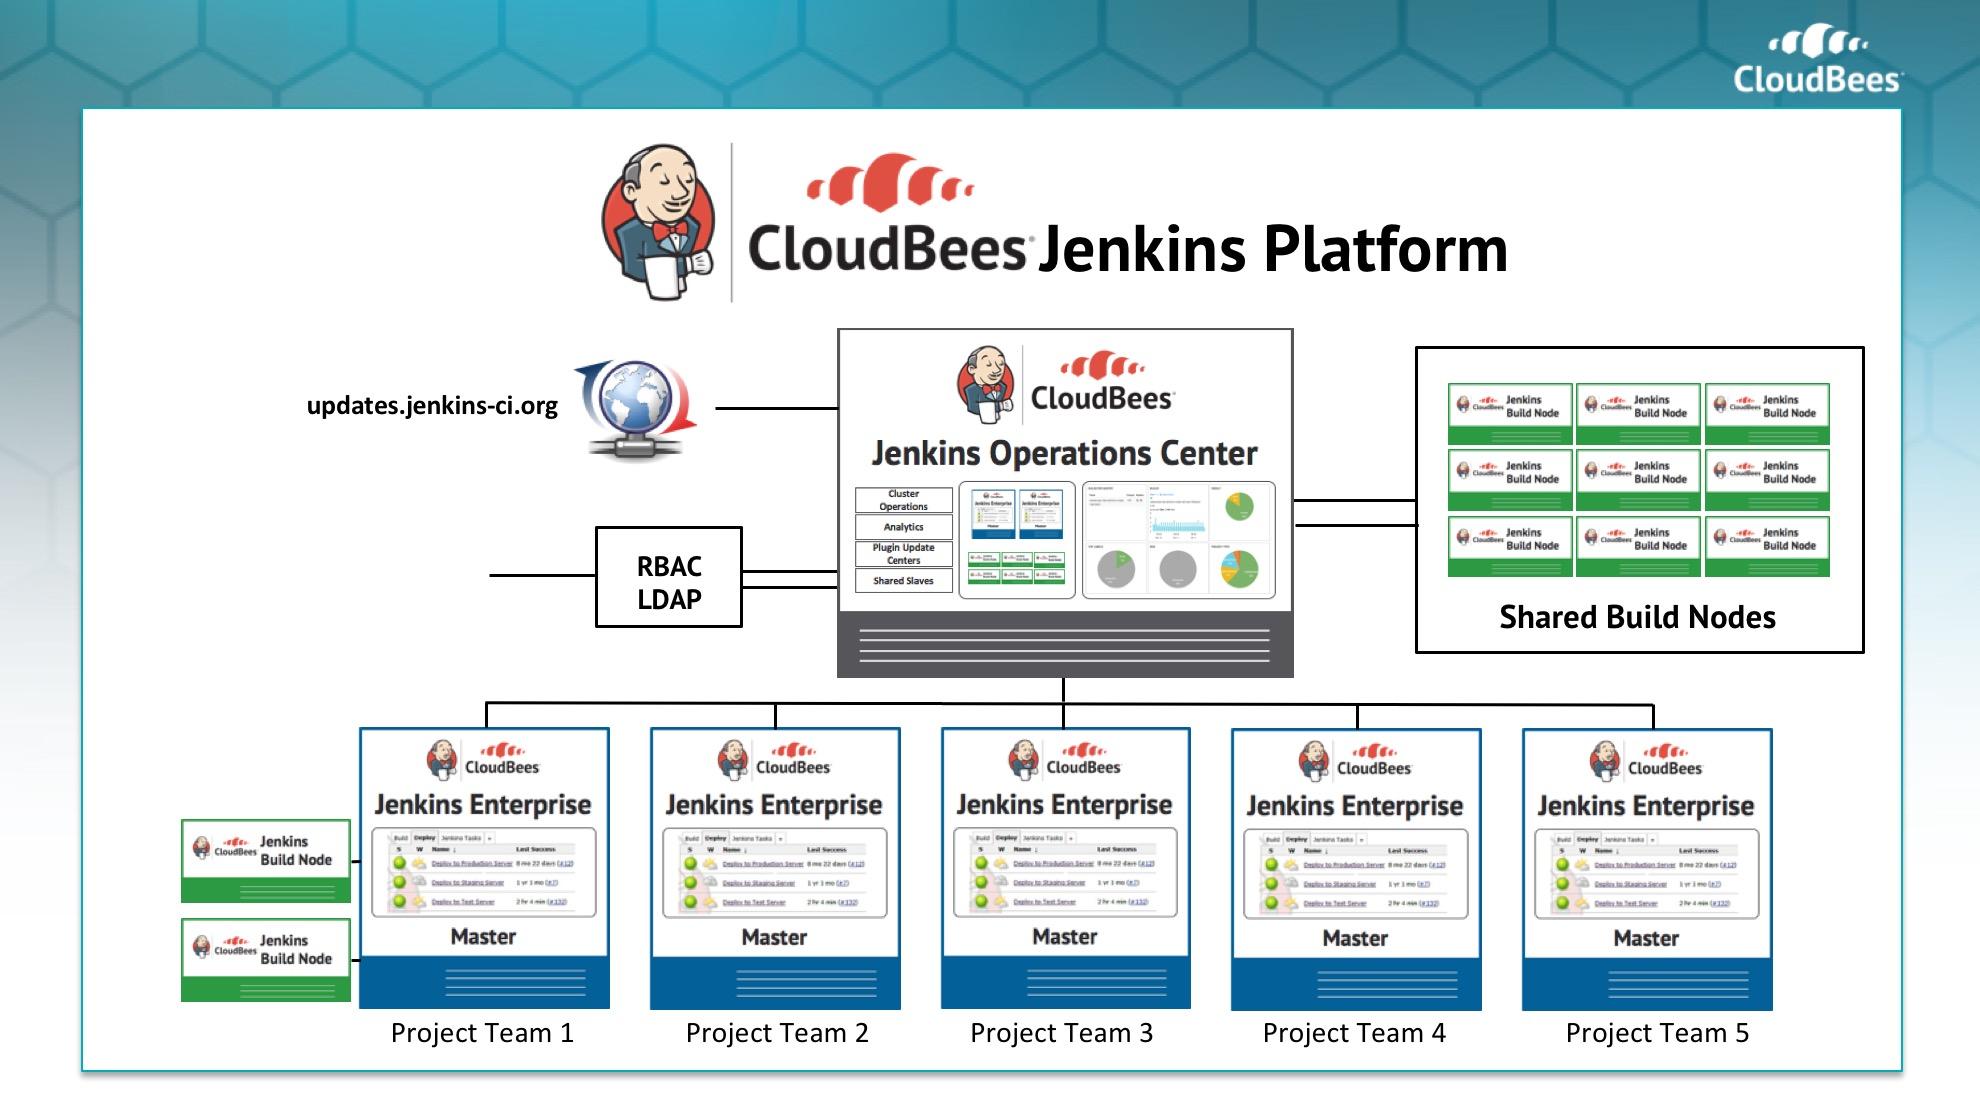 cloudbees-jenkins-platform.jpg